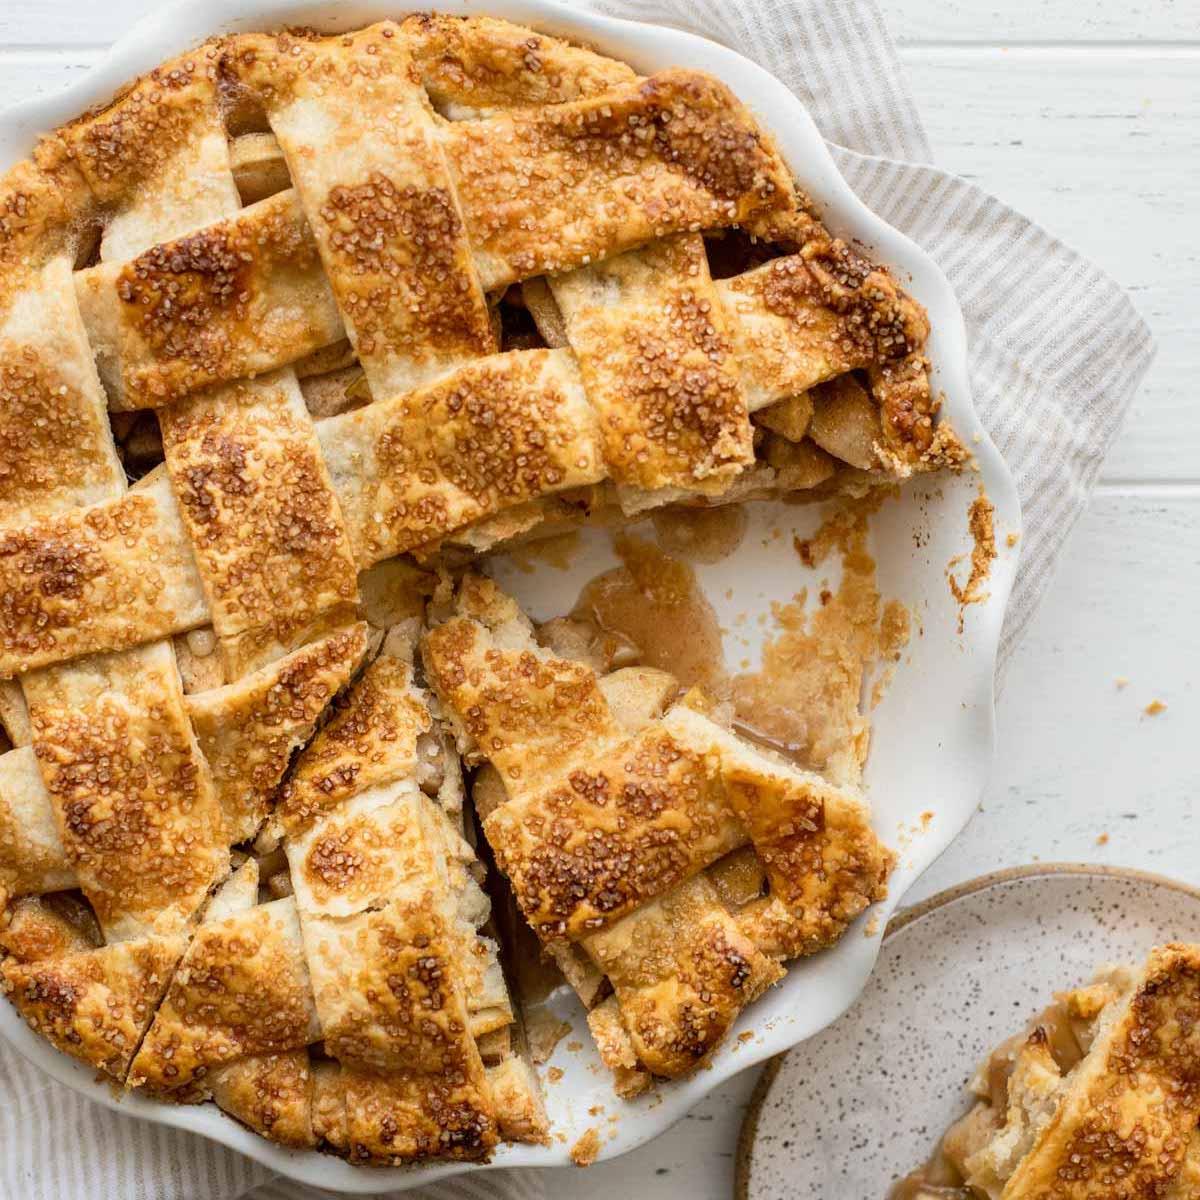 Apple Pie Recipe The BEST   Live Well Bake Often